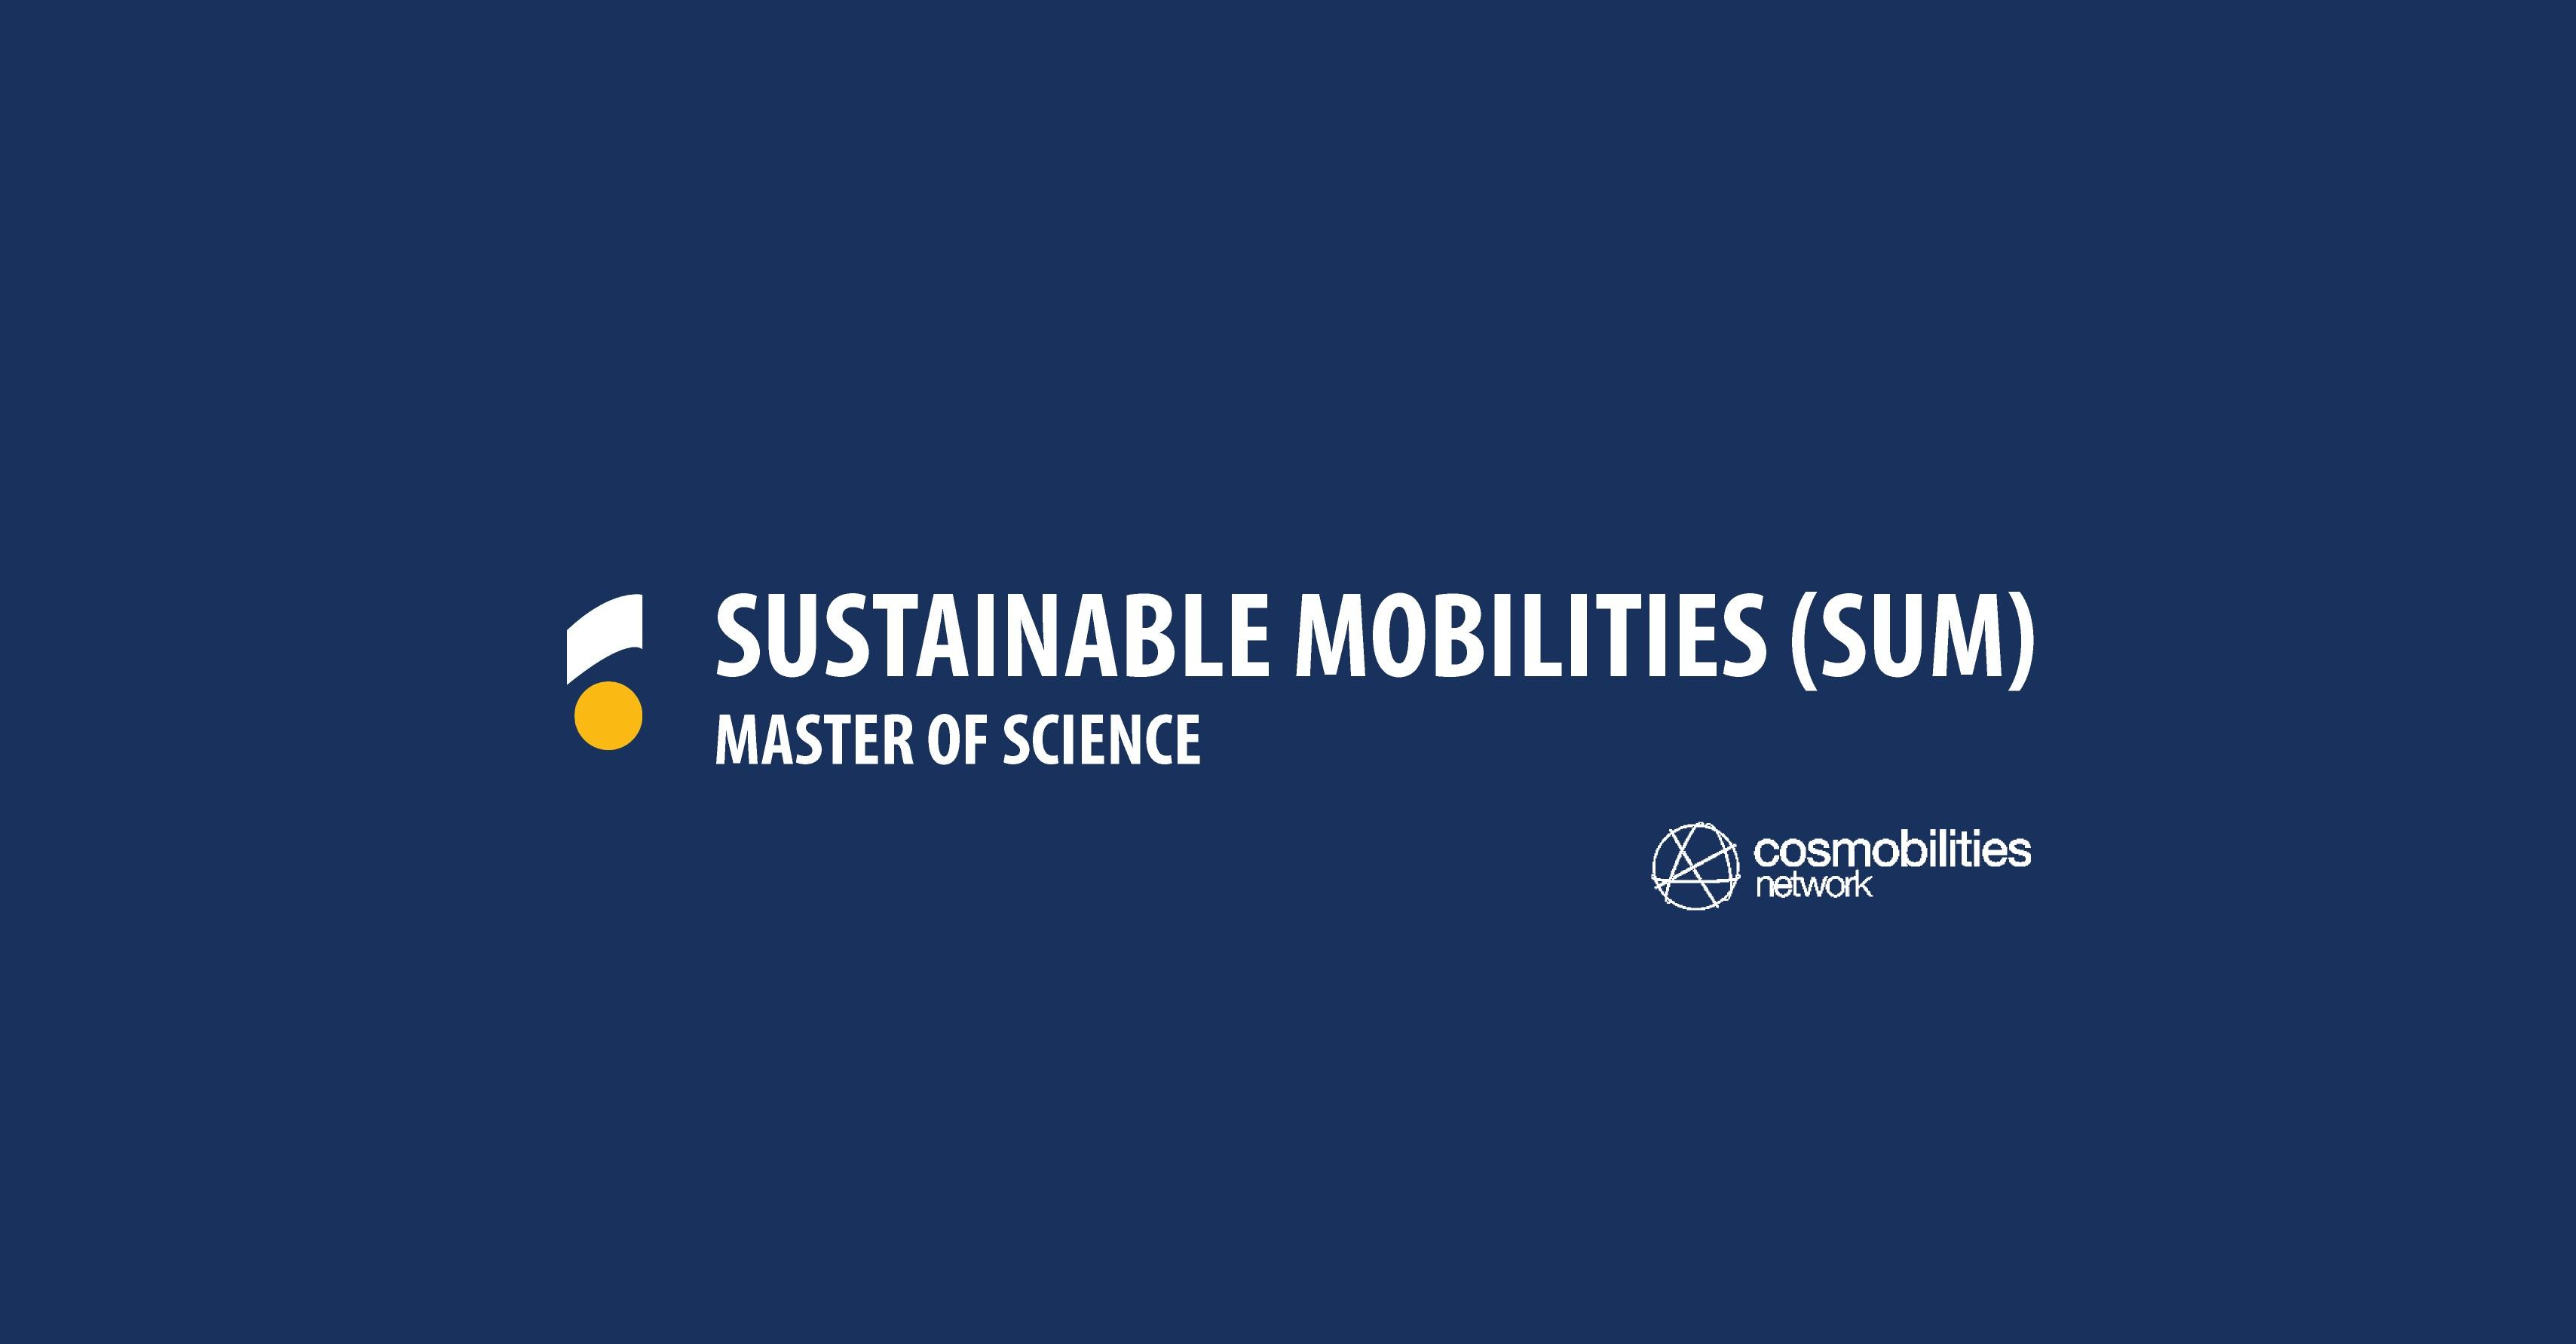 Sustainable Mobilities Hfwu Geislingen Linkedin